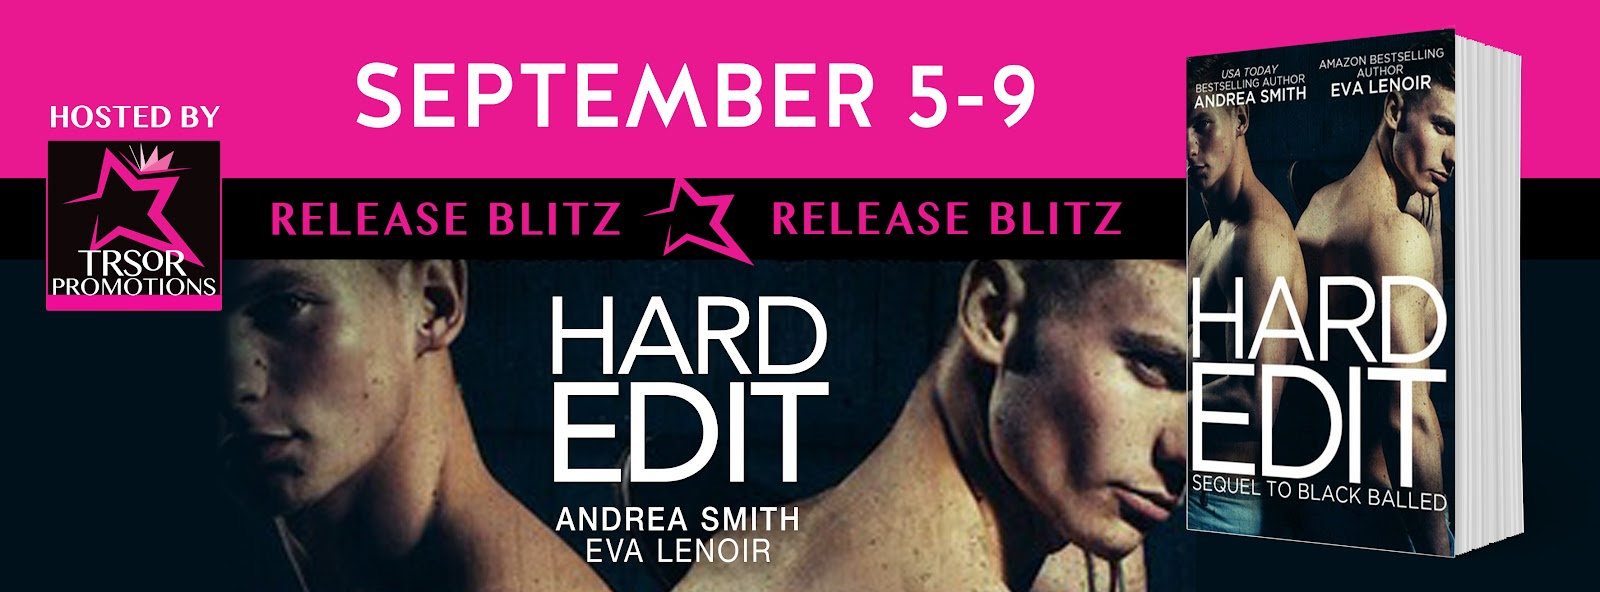 HARD_EDIT_RELEASE_BLITZ.jpg